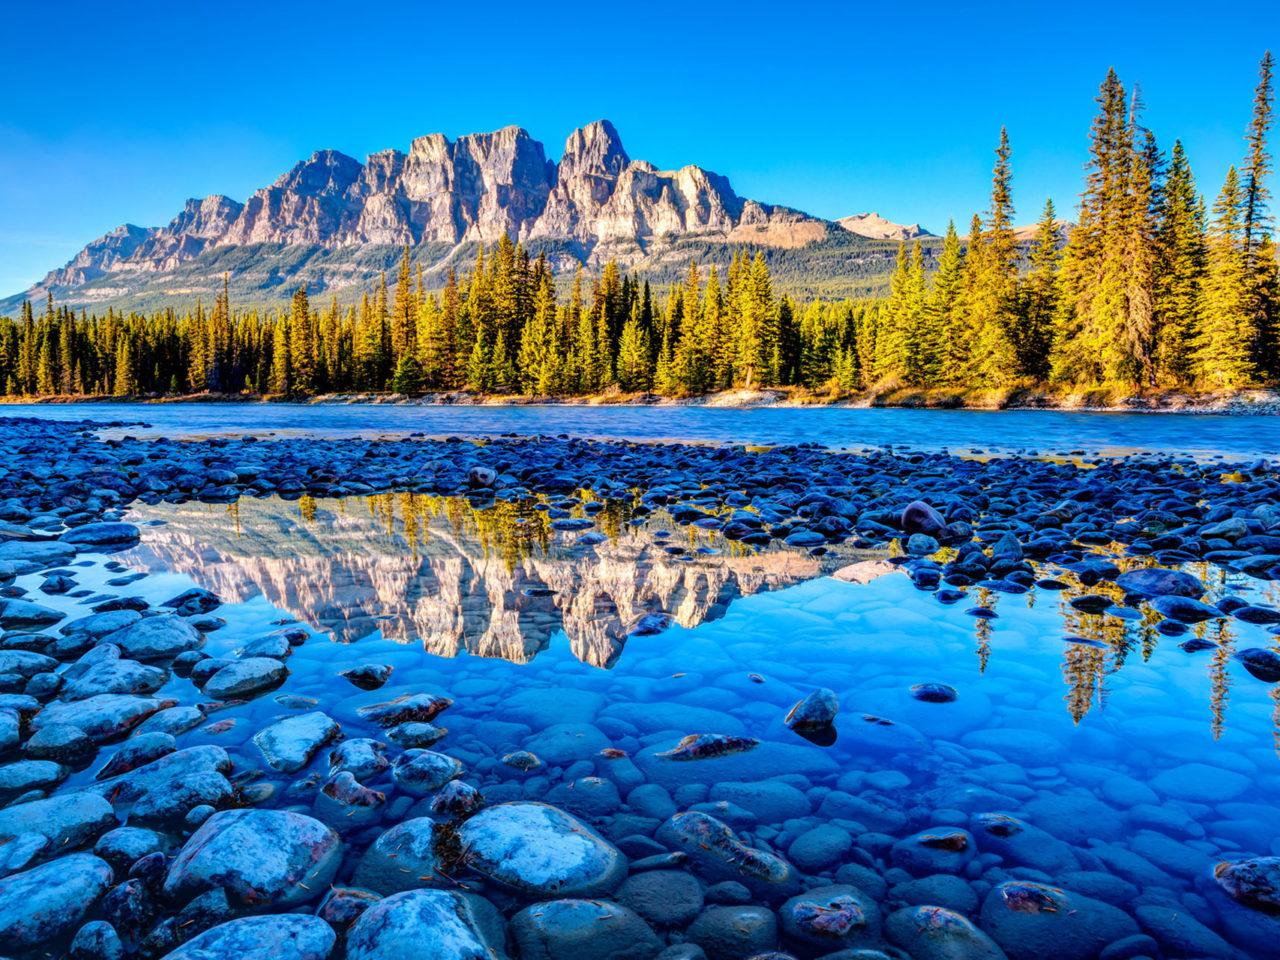 Free Christmas Wallpaper Iphone 4 Canada S Banff National Park Alberta Beautiful Mountain